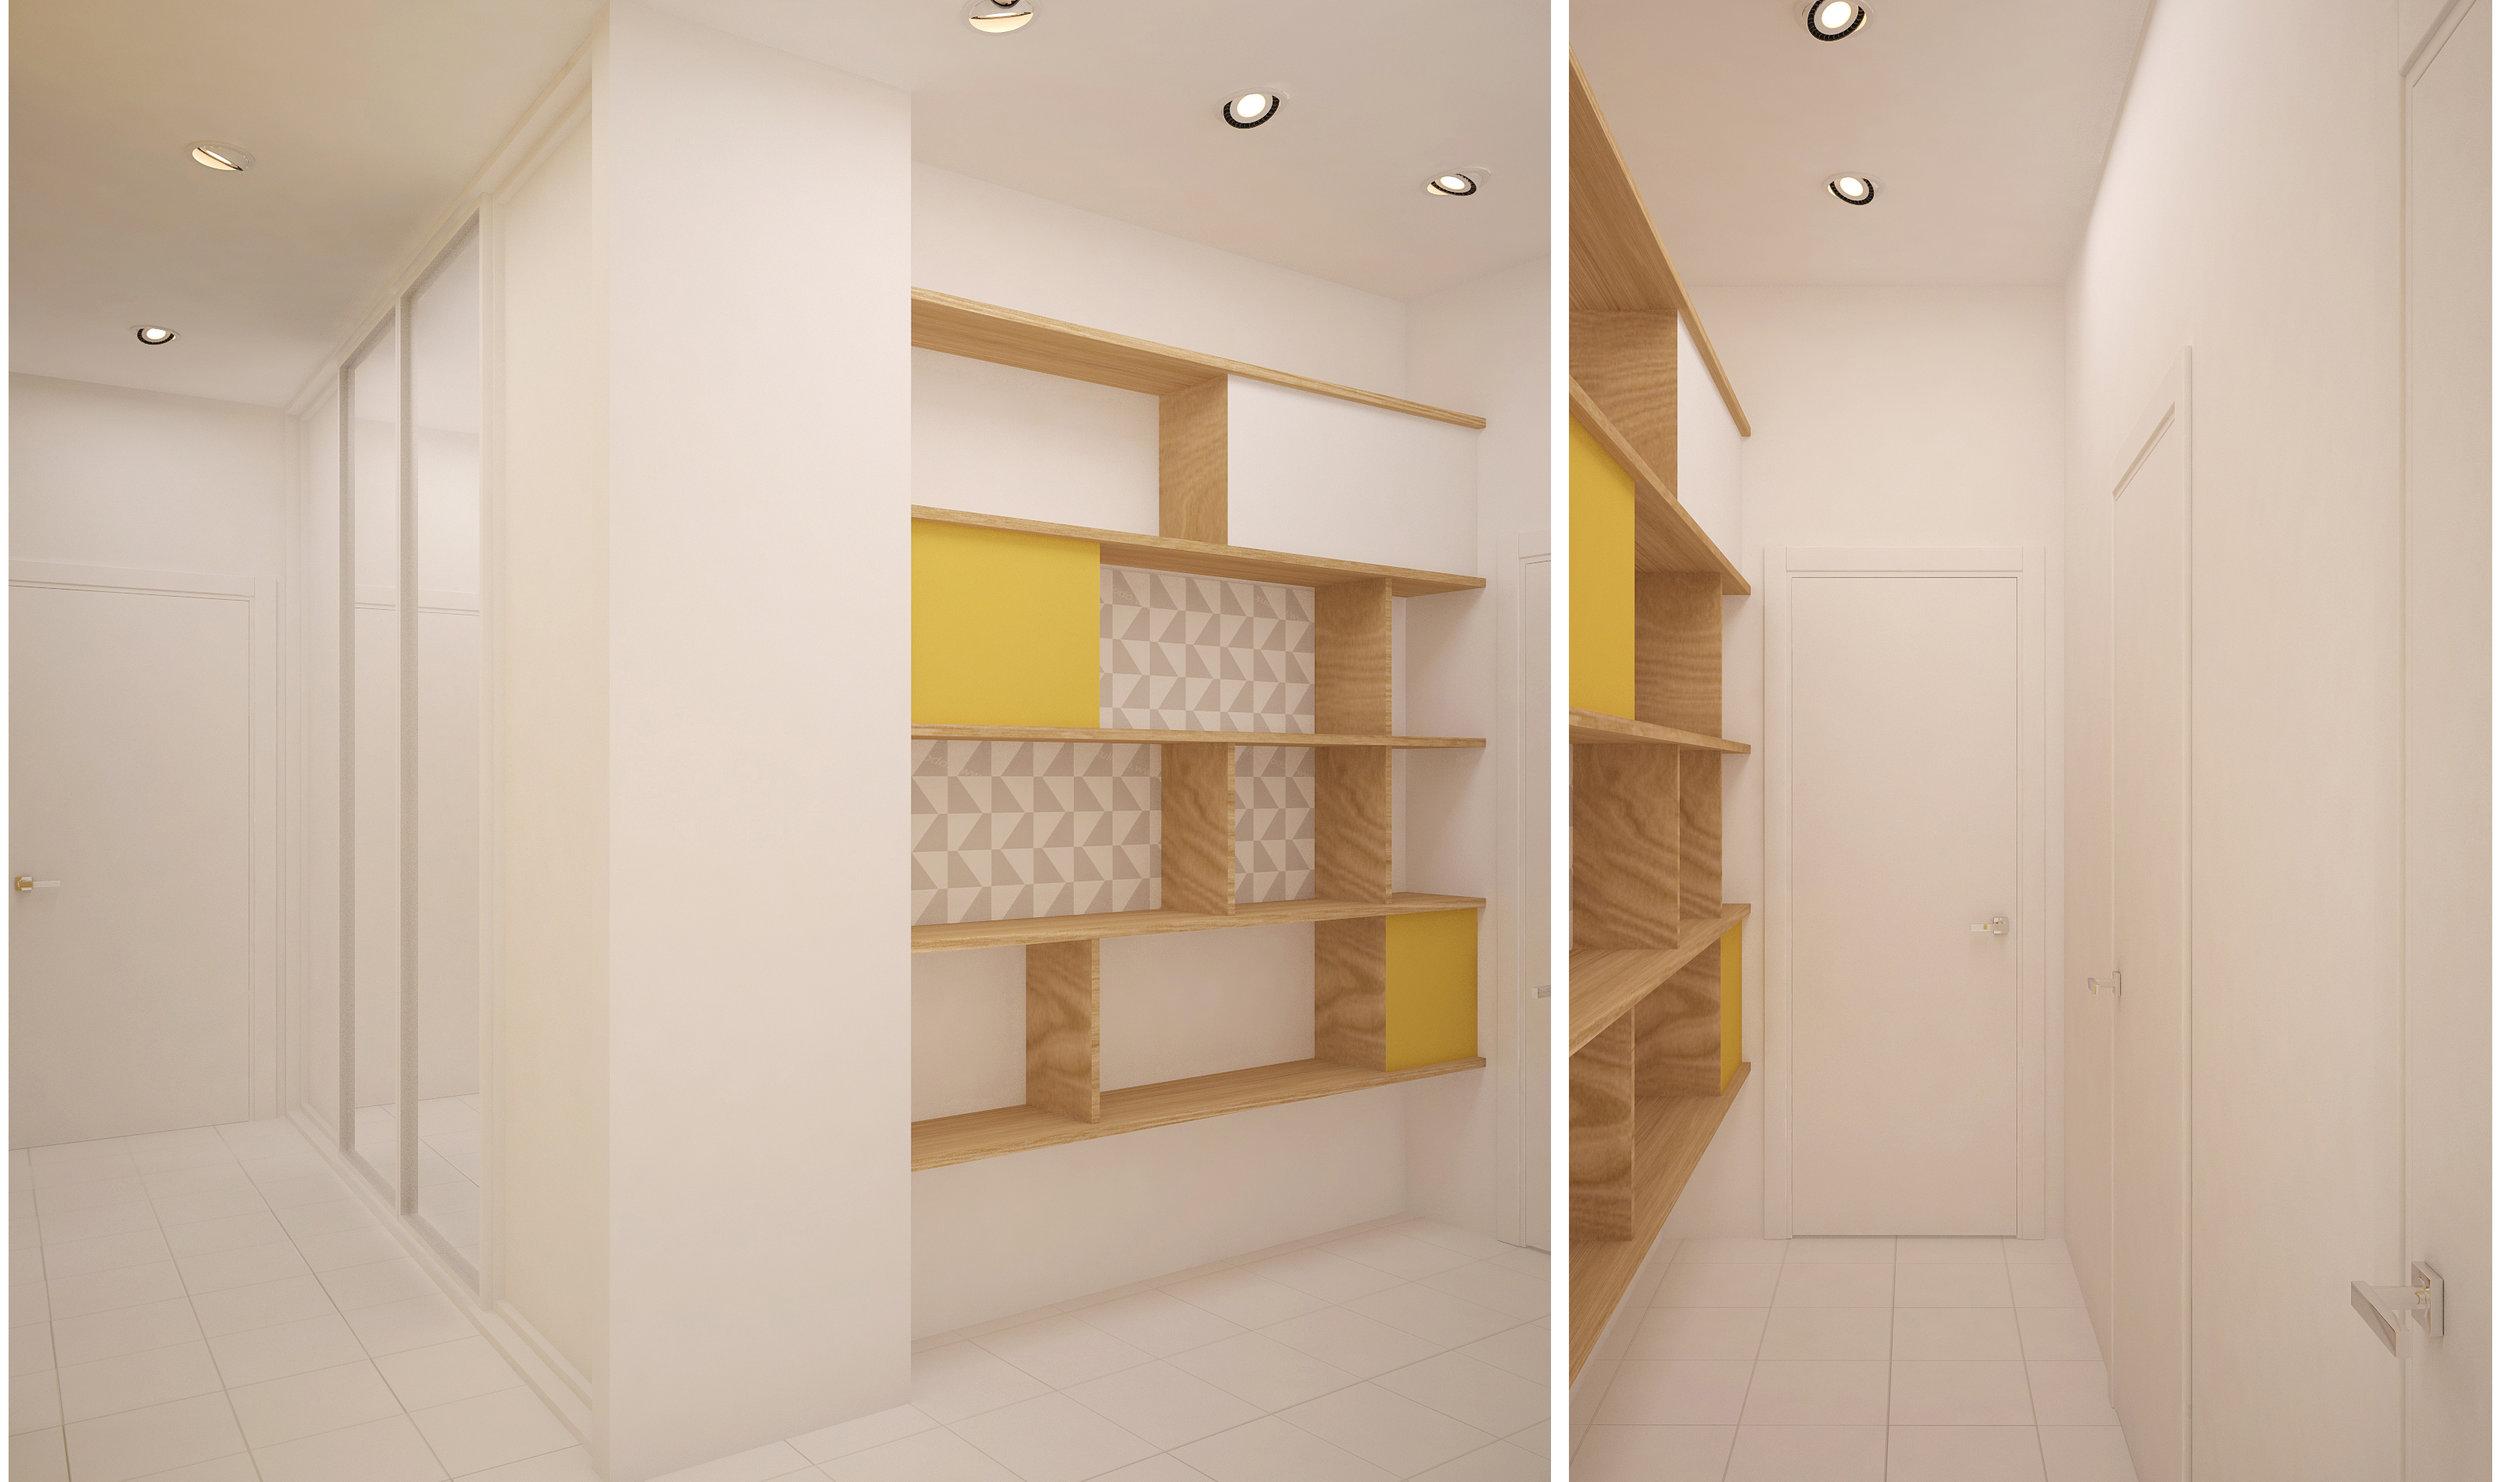 Copy of Scandinavian style apartment interior. Corridor